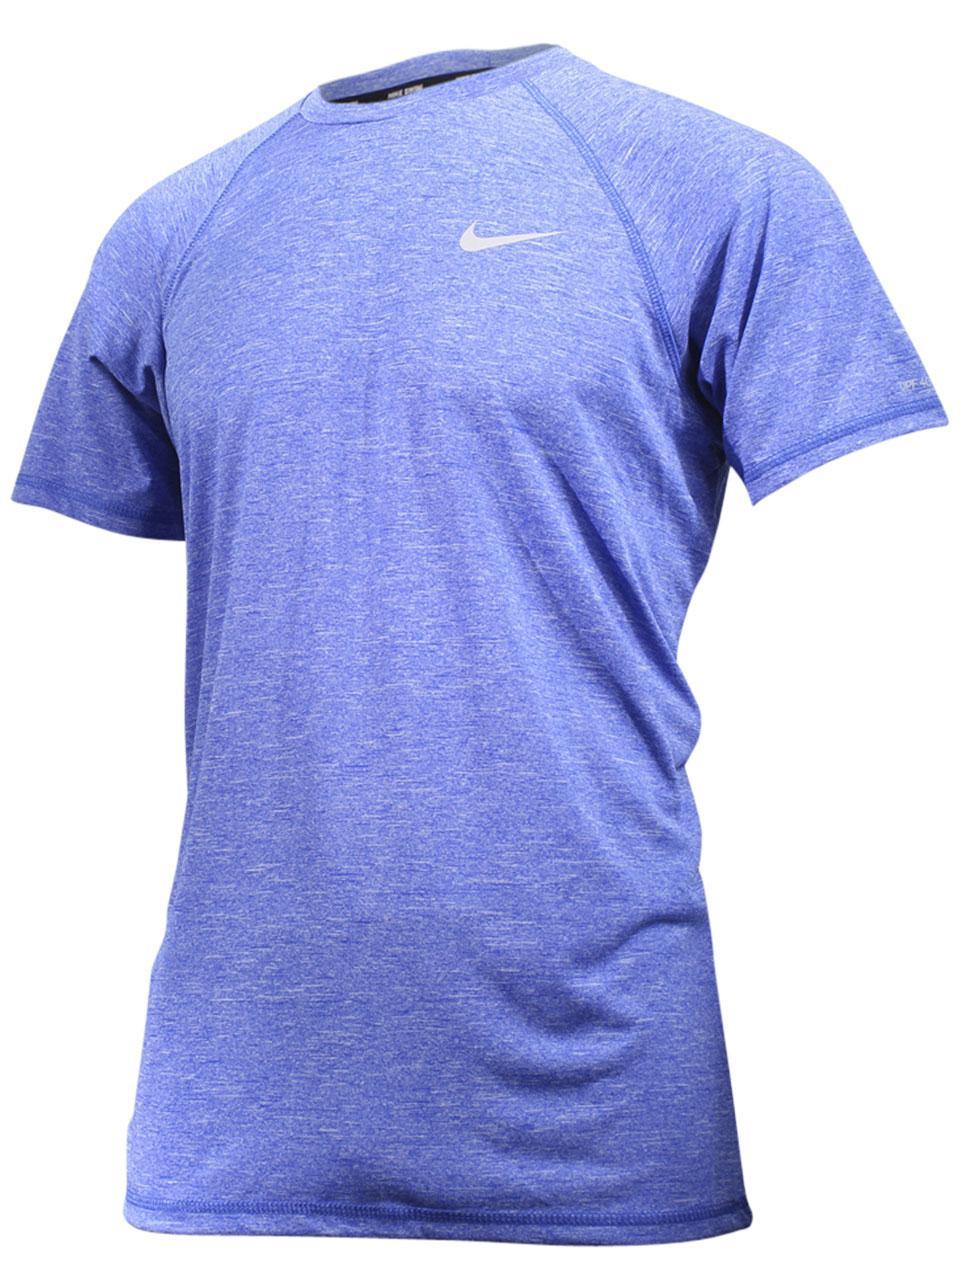 79cc47a0f Nike Men's Heather Short Sleeve Hydroguard Shirt Swimwear